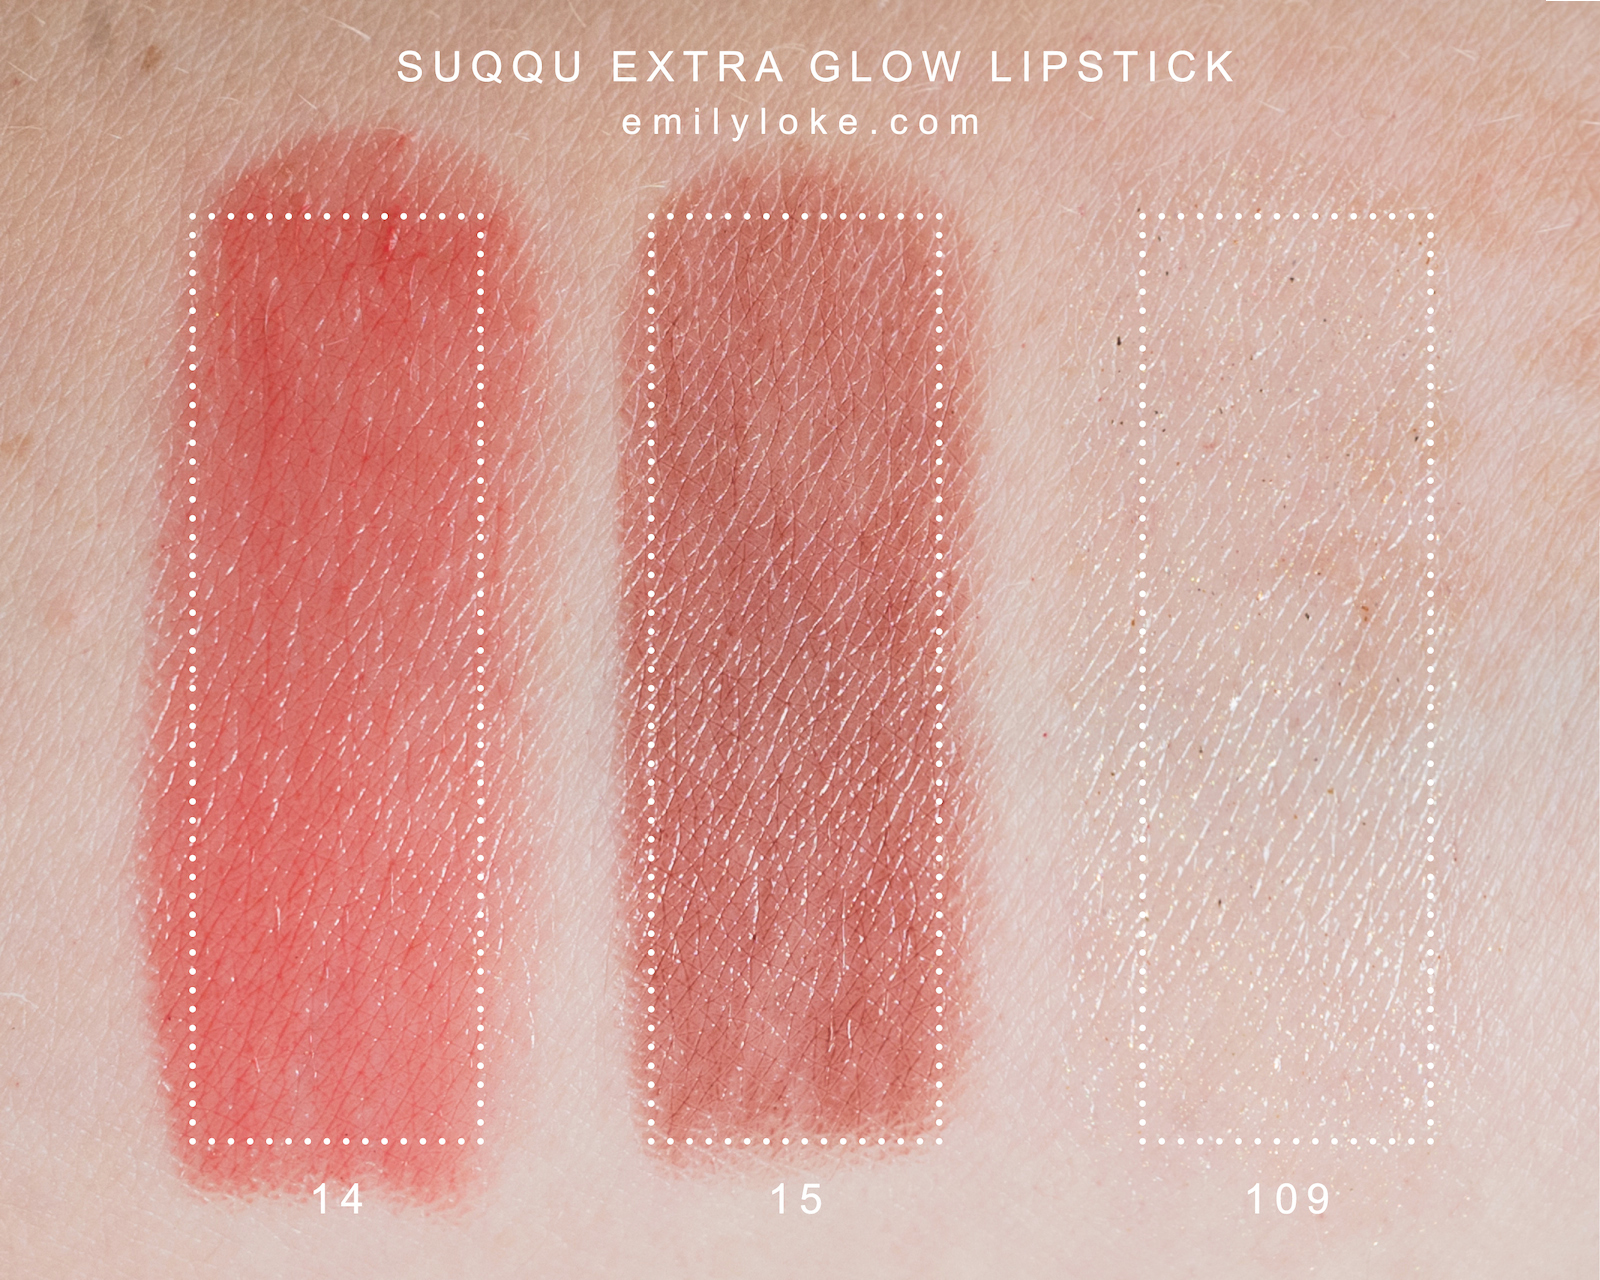 SUQQU extra glow lipstick